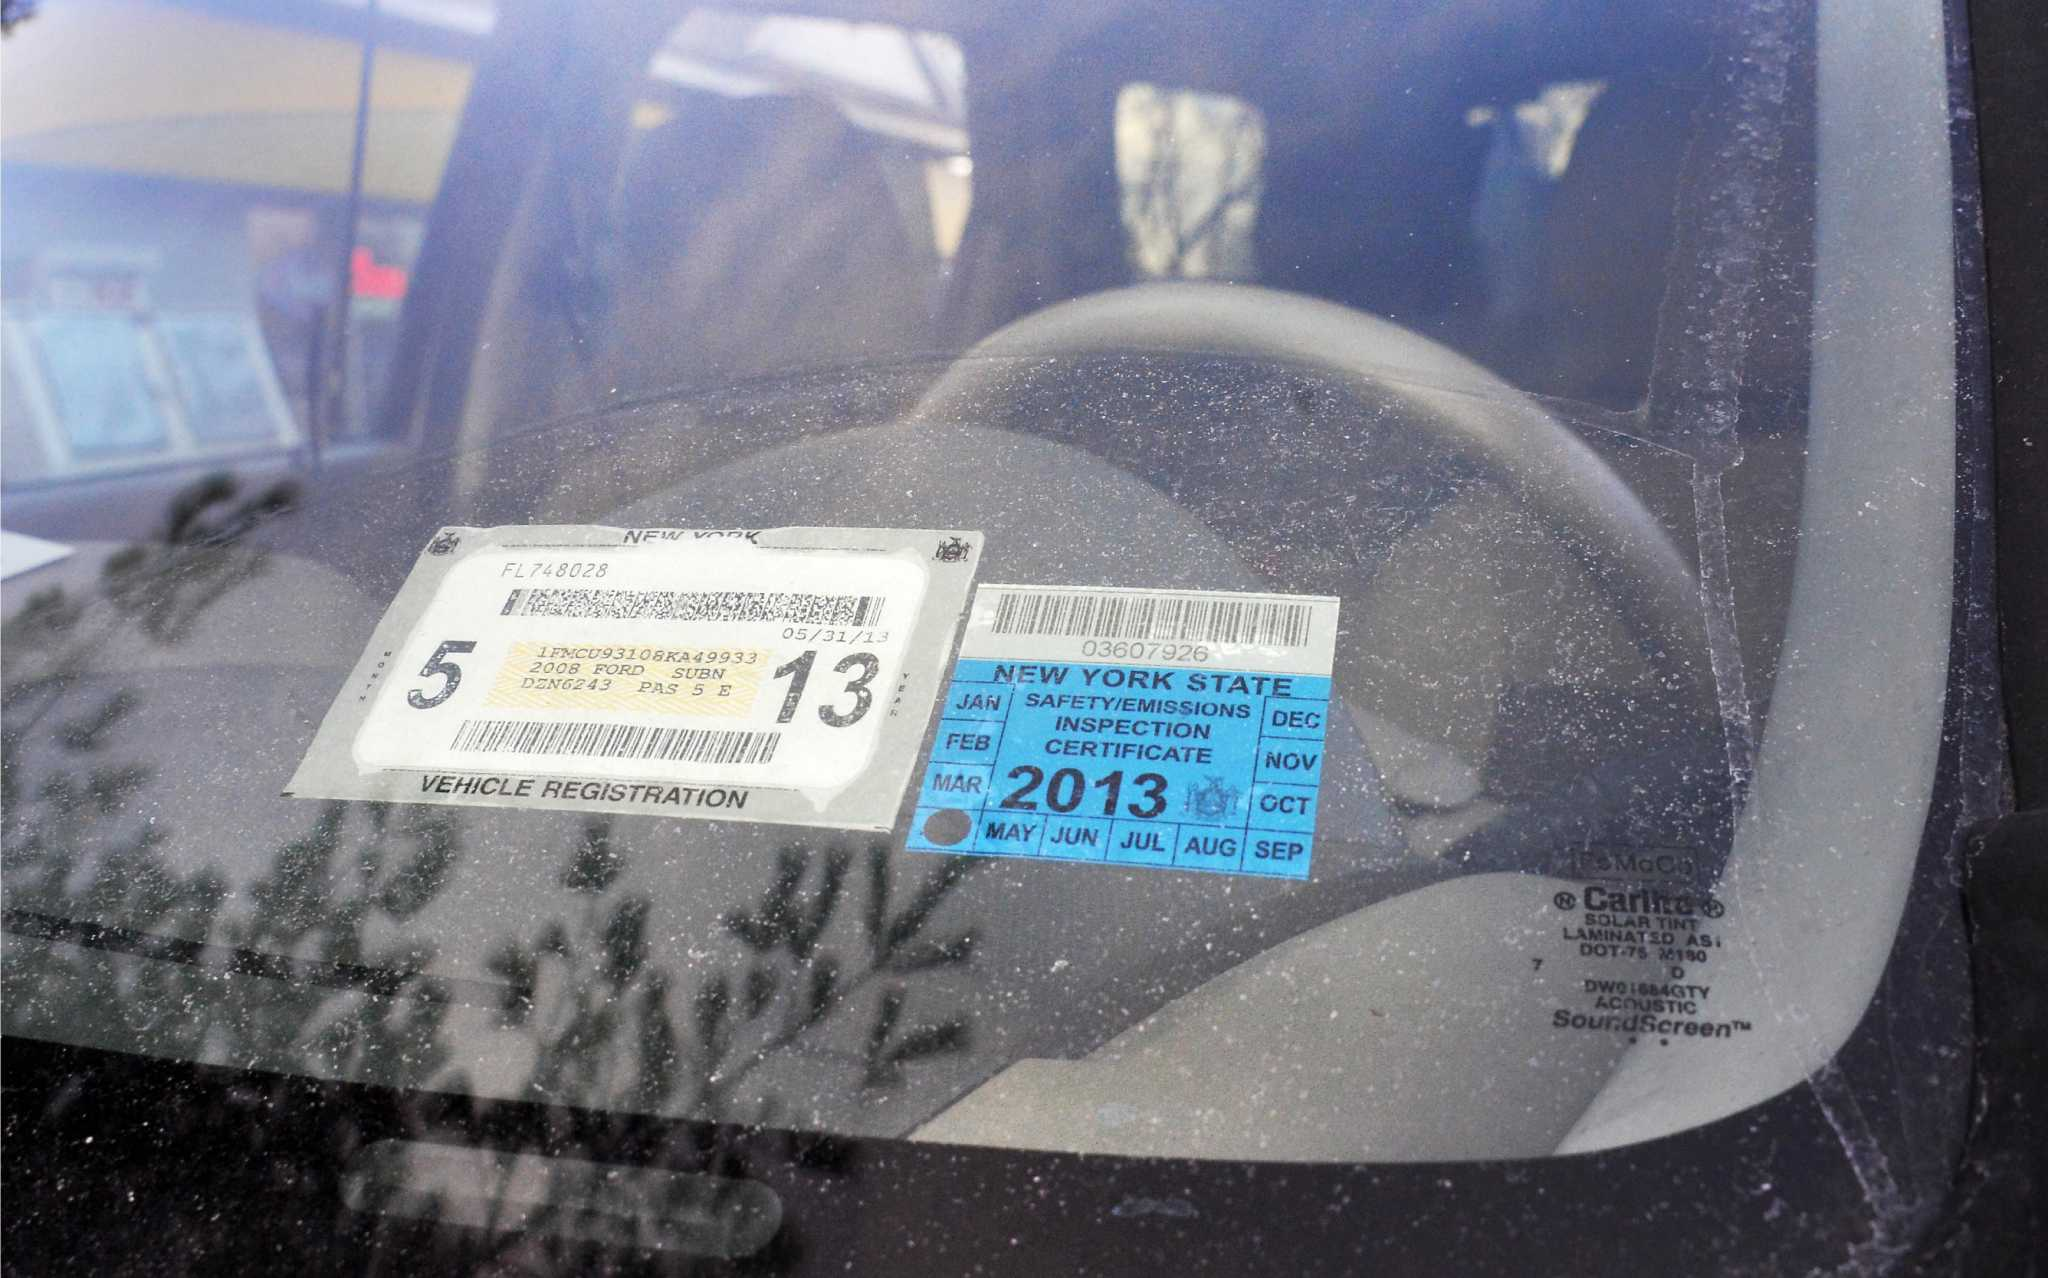 Flaws delay DMV registration stickers - Times Union